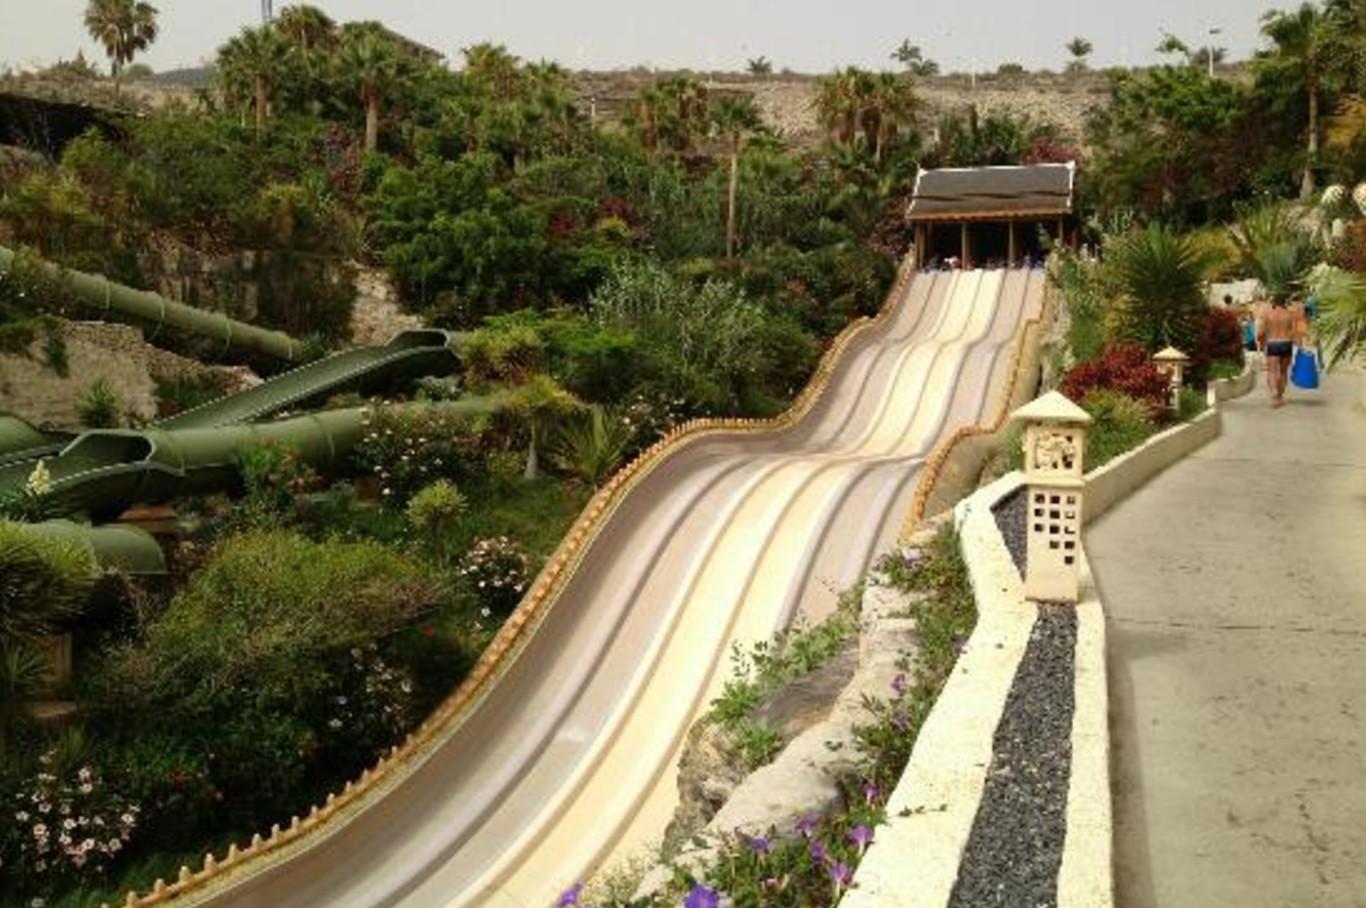 Les pistes du Naga Race